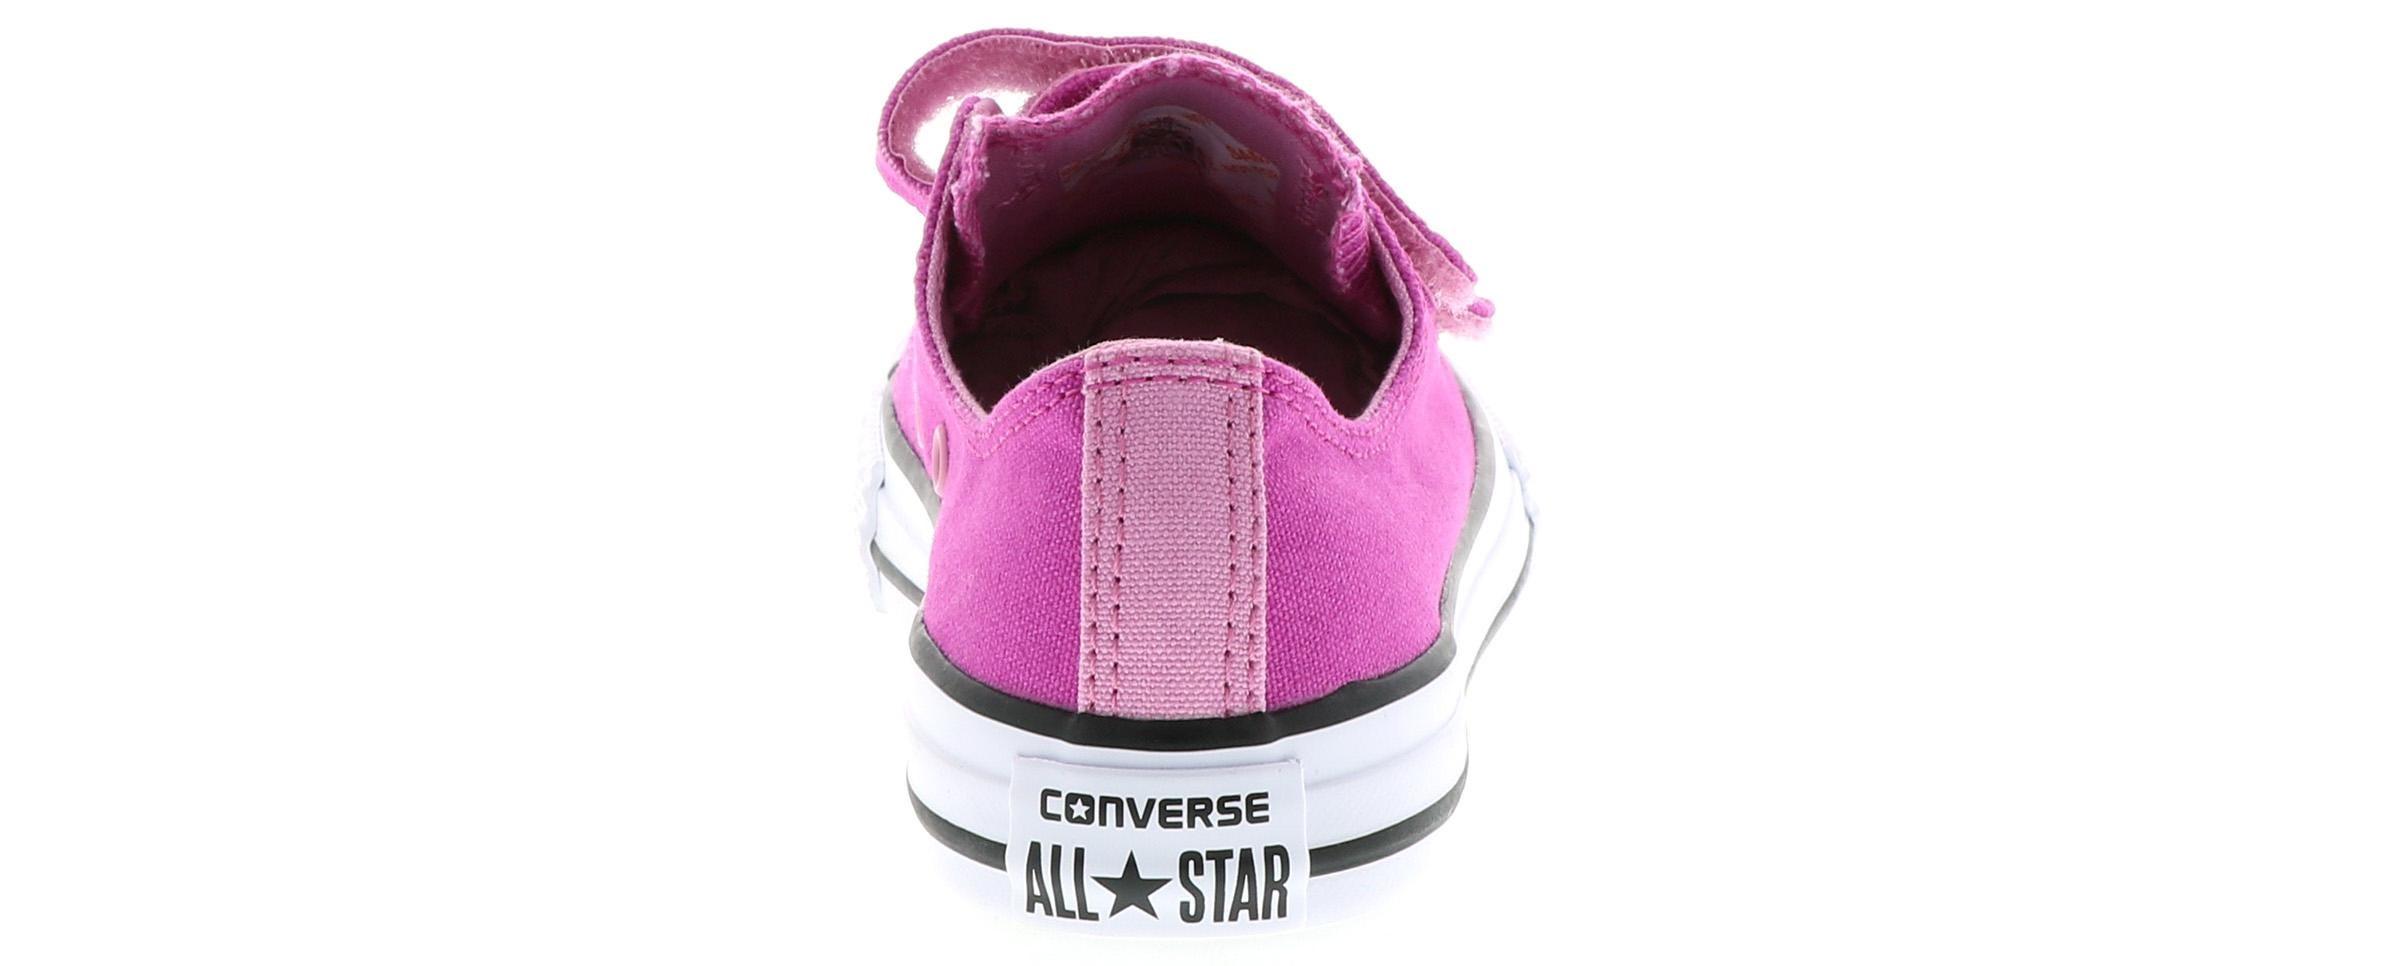 converse 3v